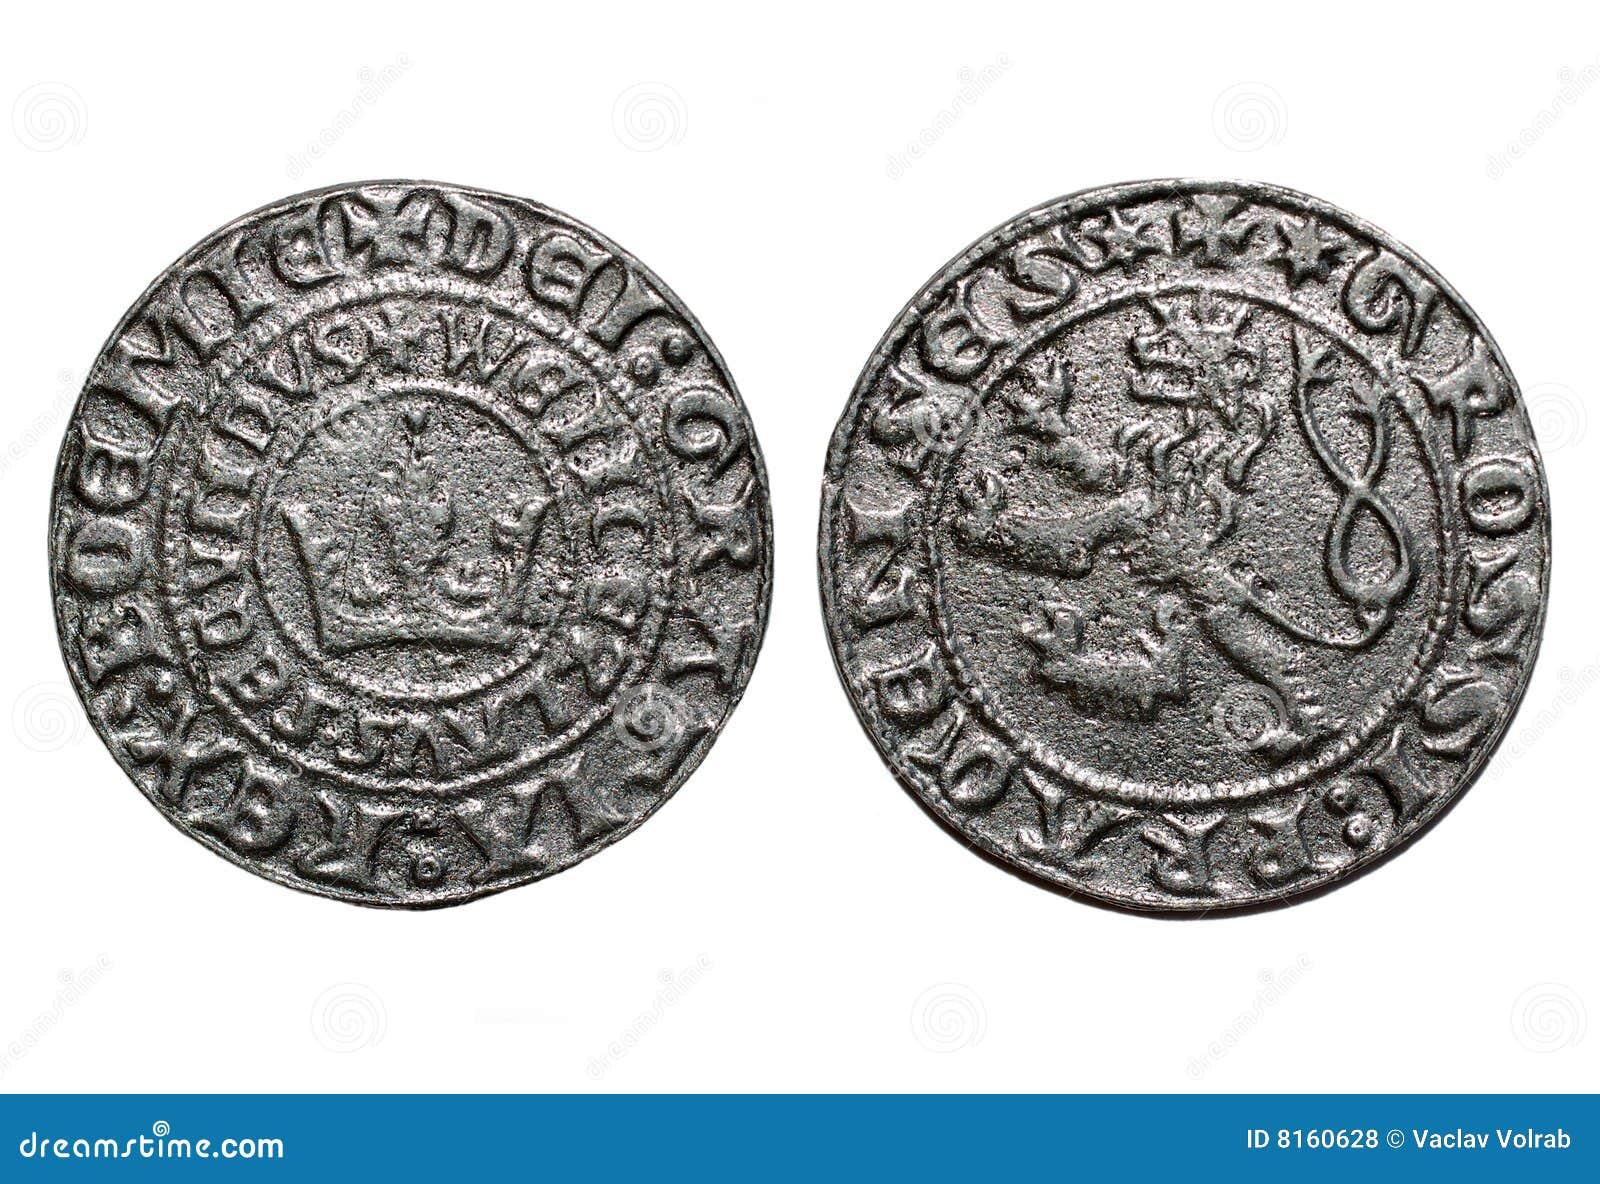 Medieval Coin Prague Groschen 700 Years Old Coin Royalty Free Stock Photos